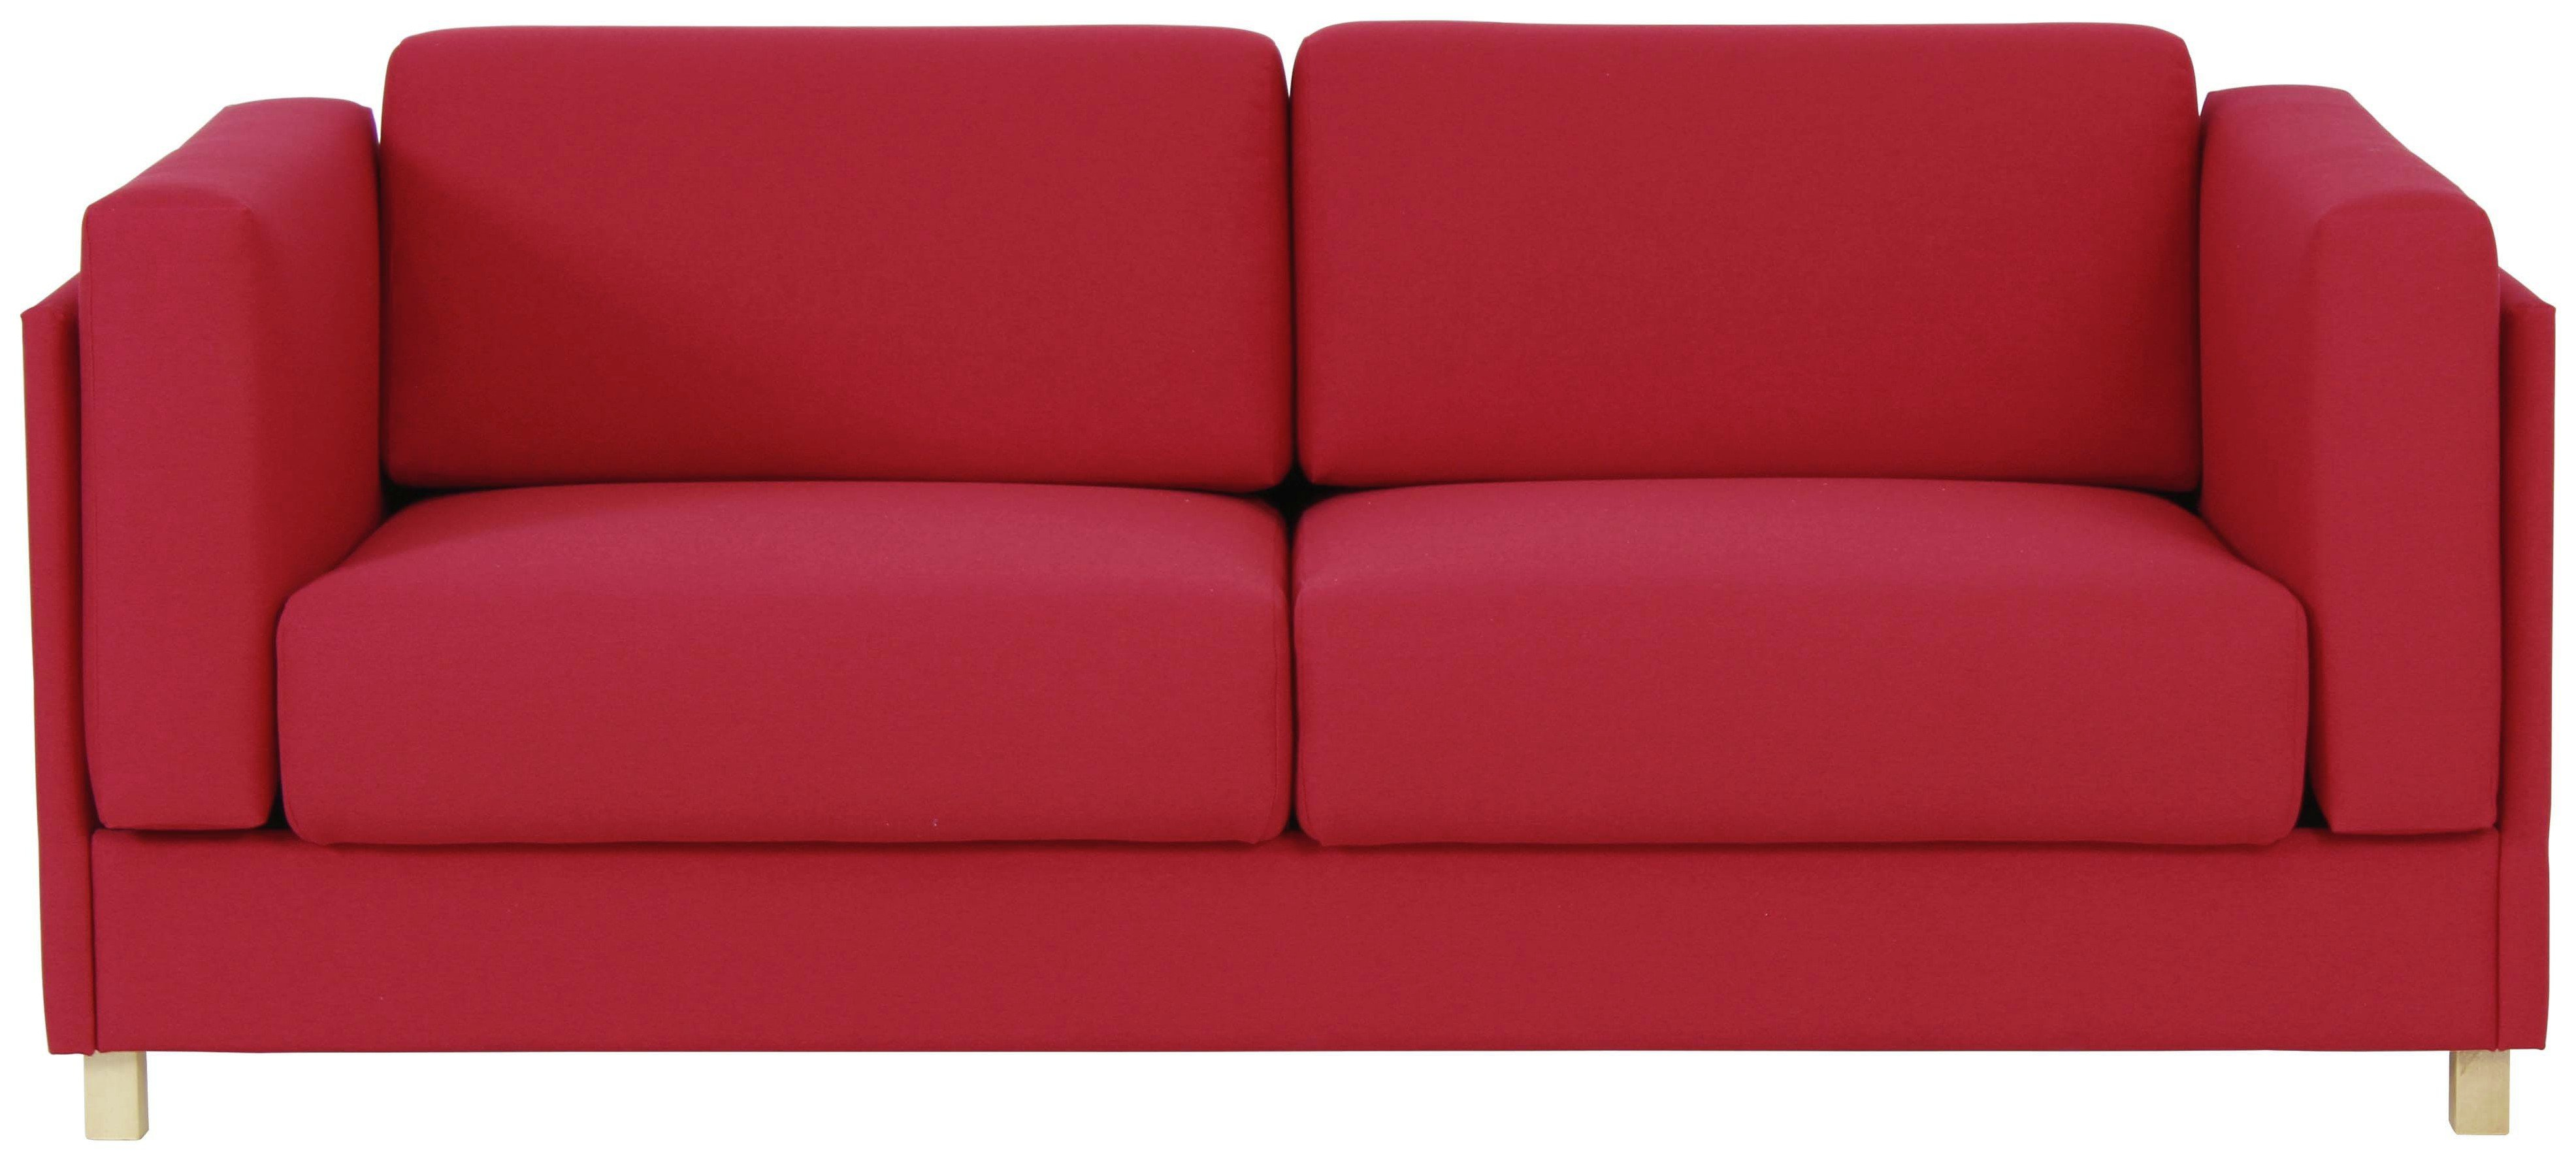 cheap sofas uk argos l shaped sofa deals habitat colombo 3 seater fabric red